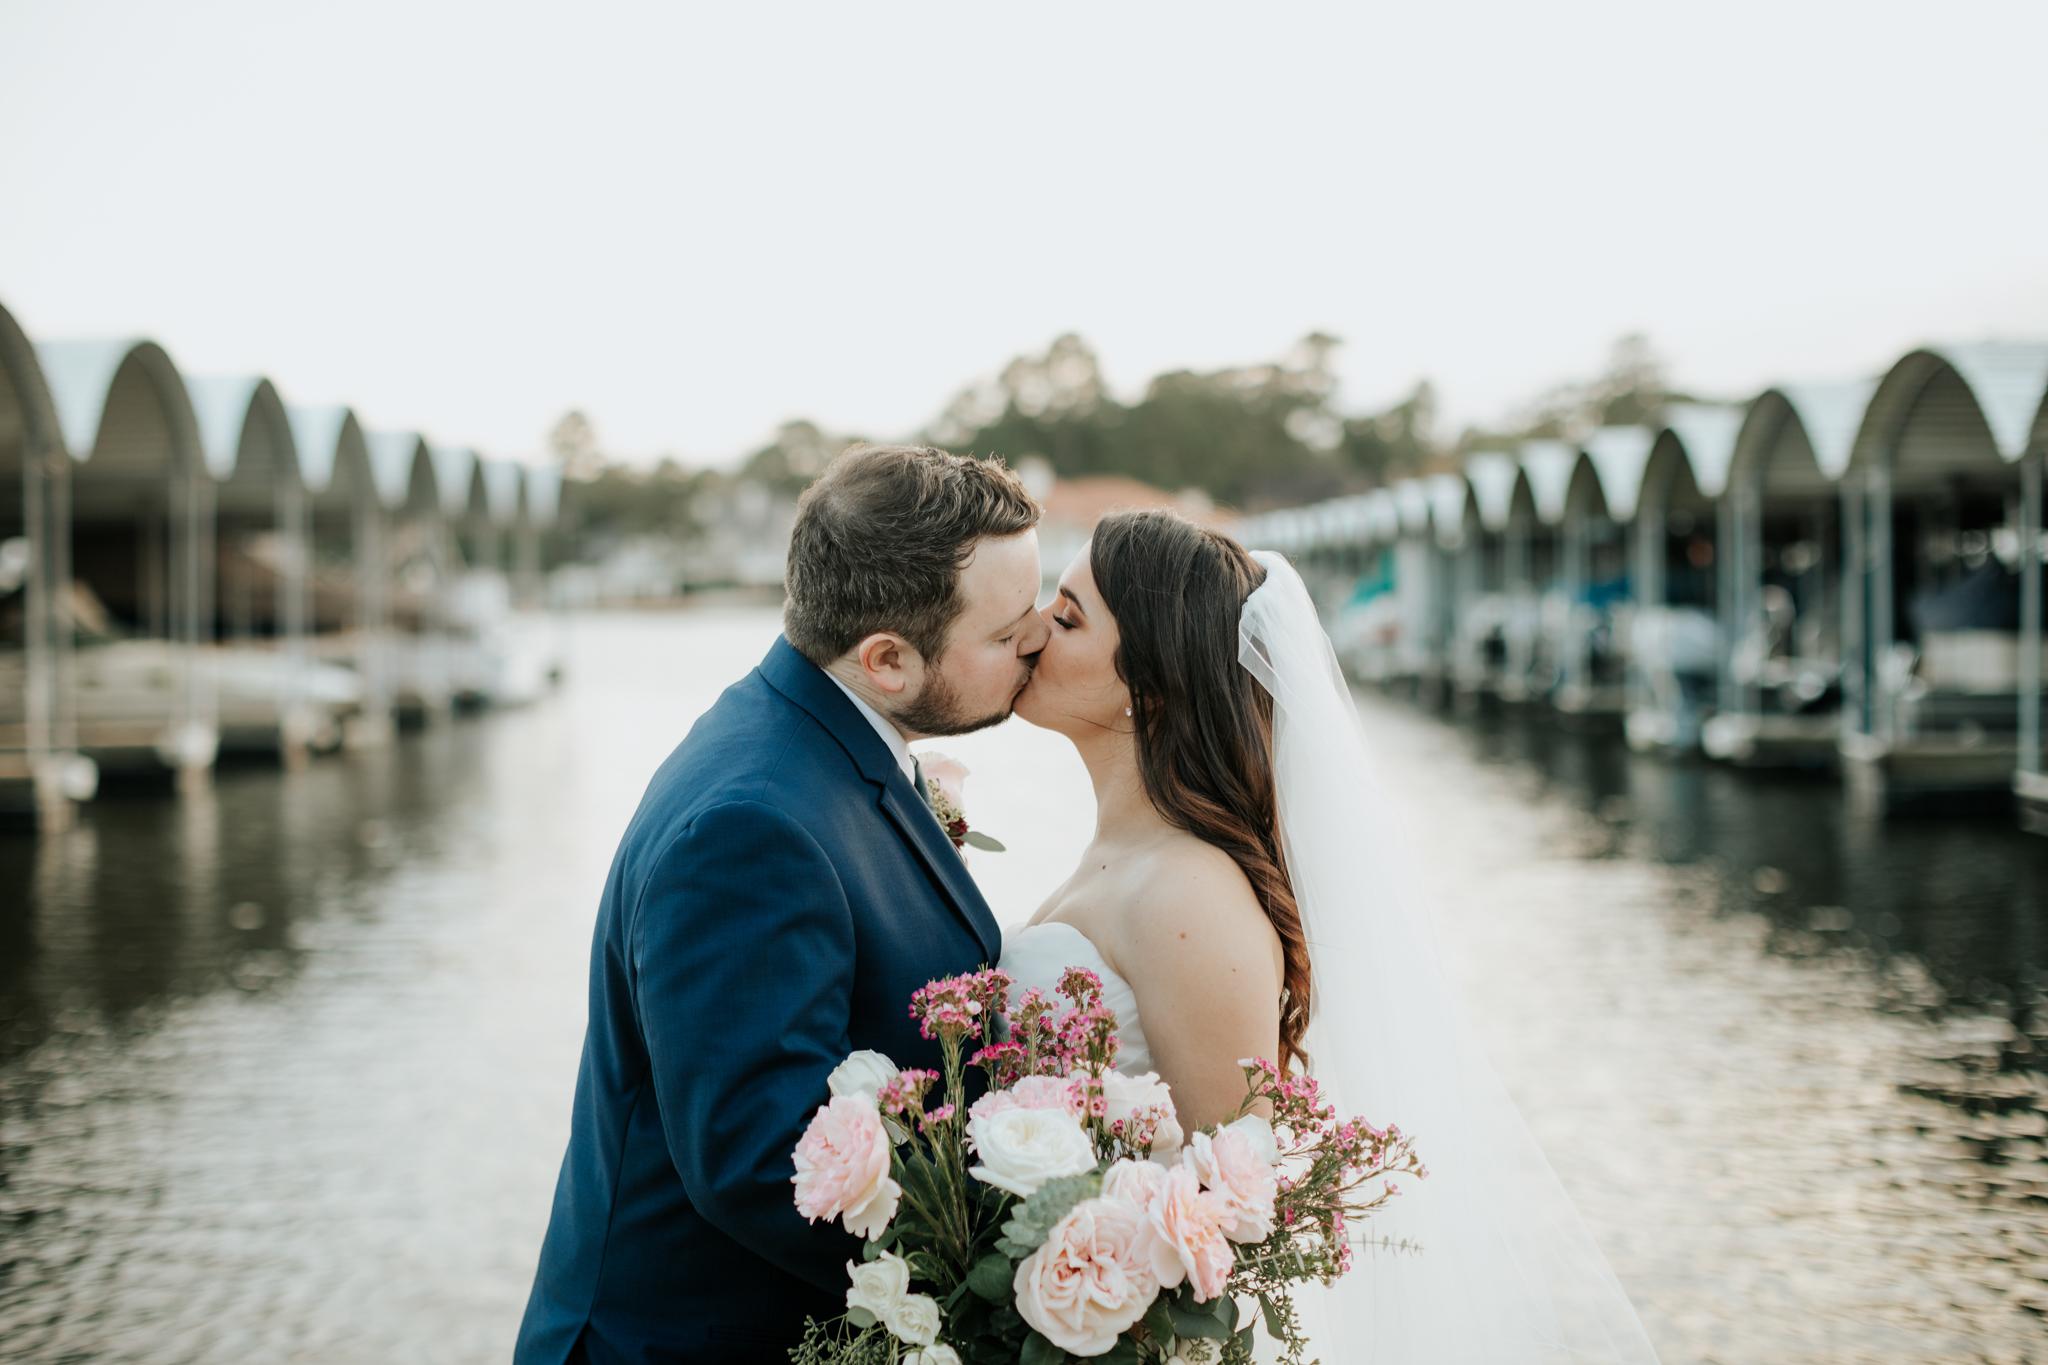 Leah Nicole Photography - Houston Wedding Photographer-Lake Conroe Wedding- Houston Wedding Photographer-39.jpg